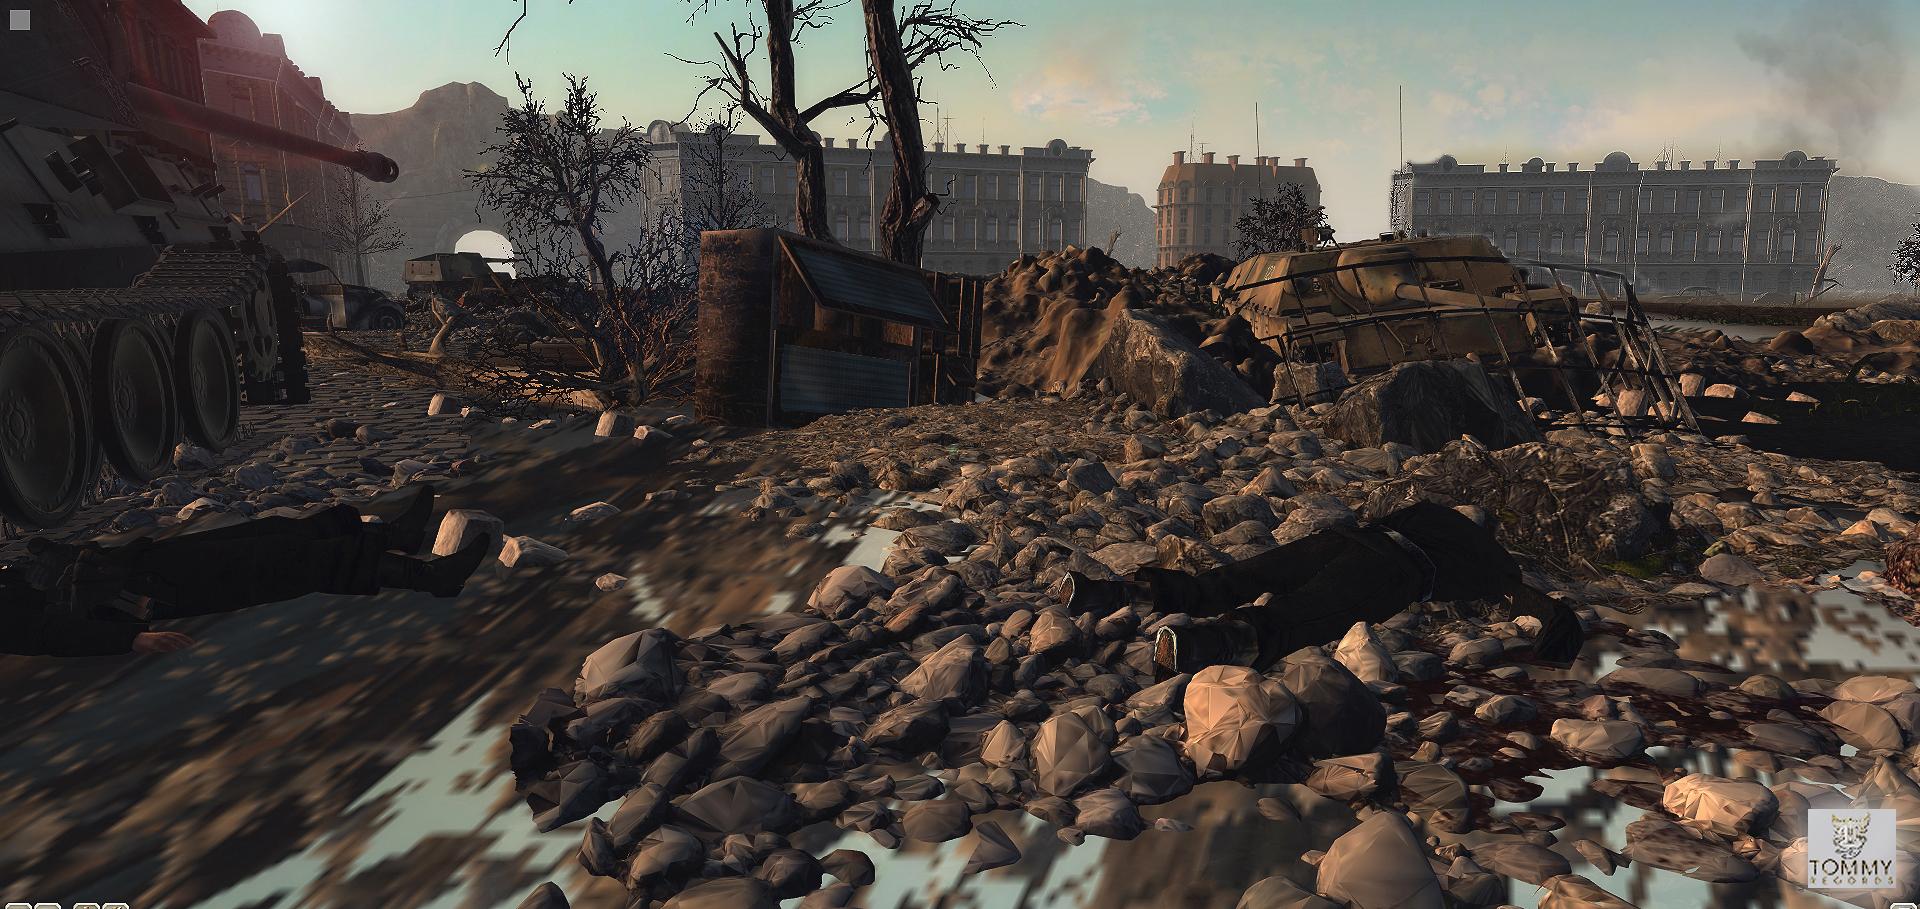 Dead bodies budapest battle